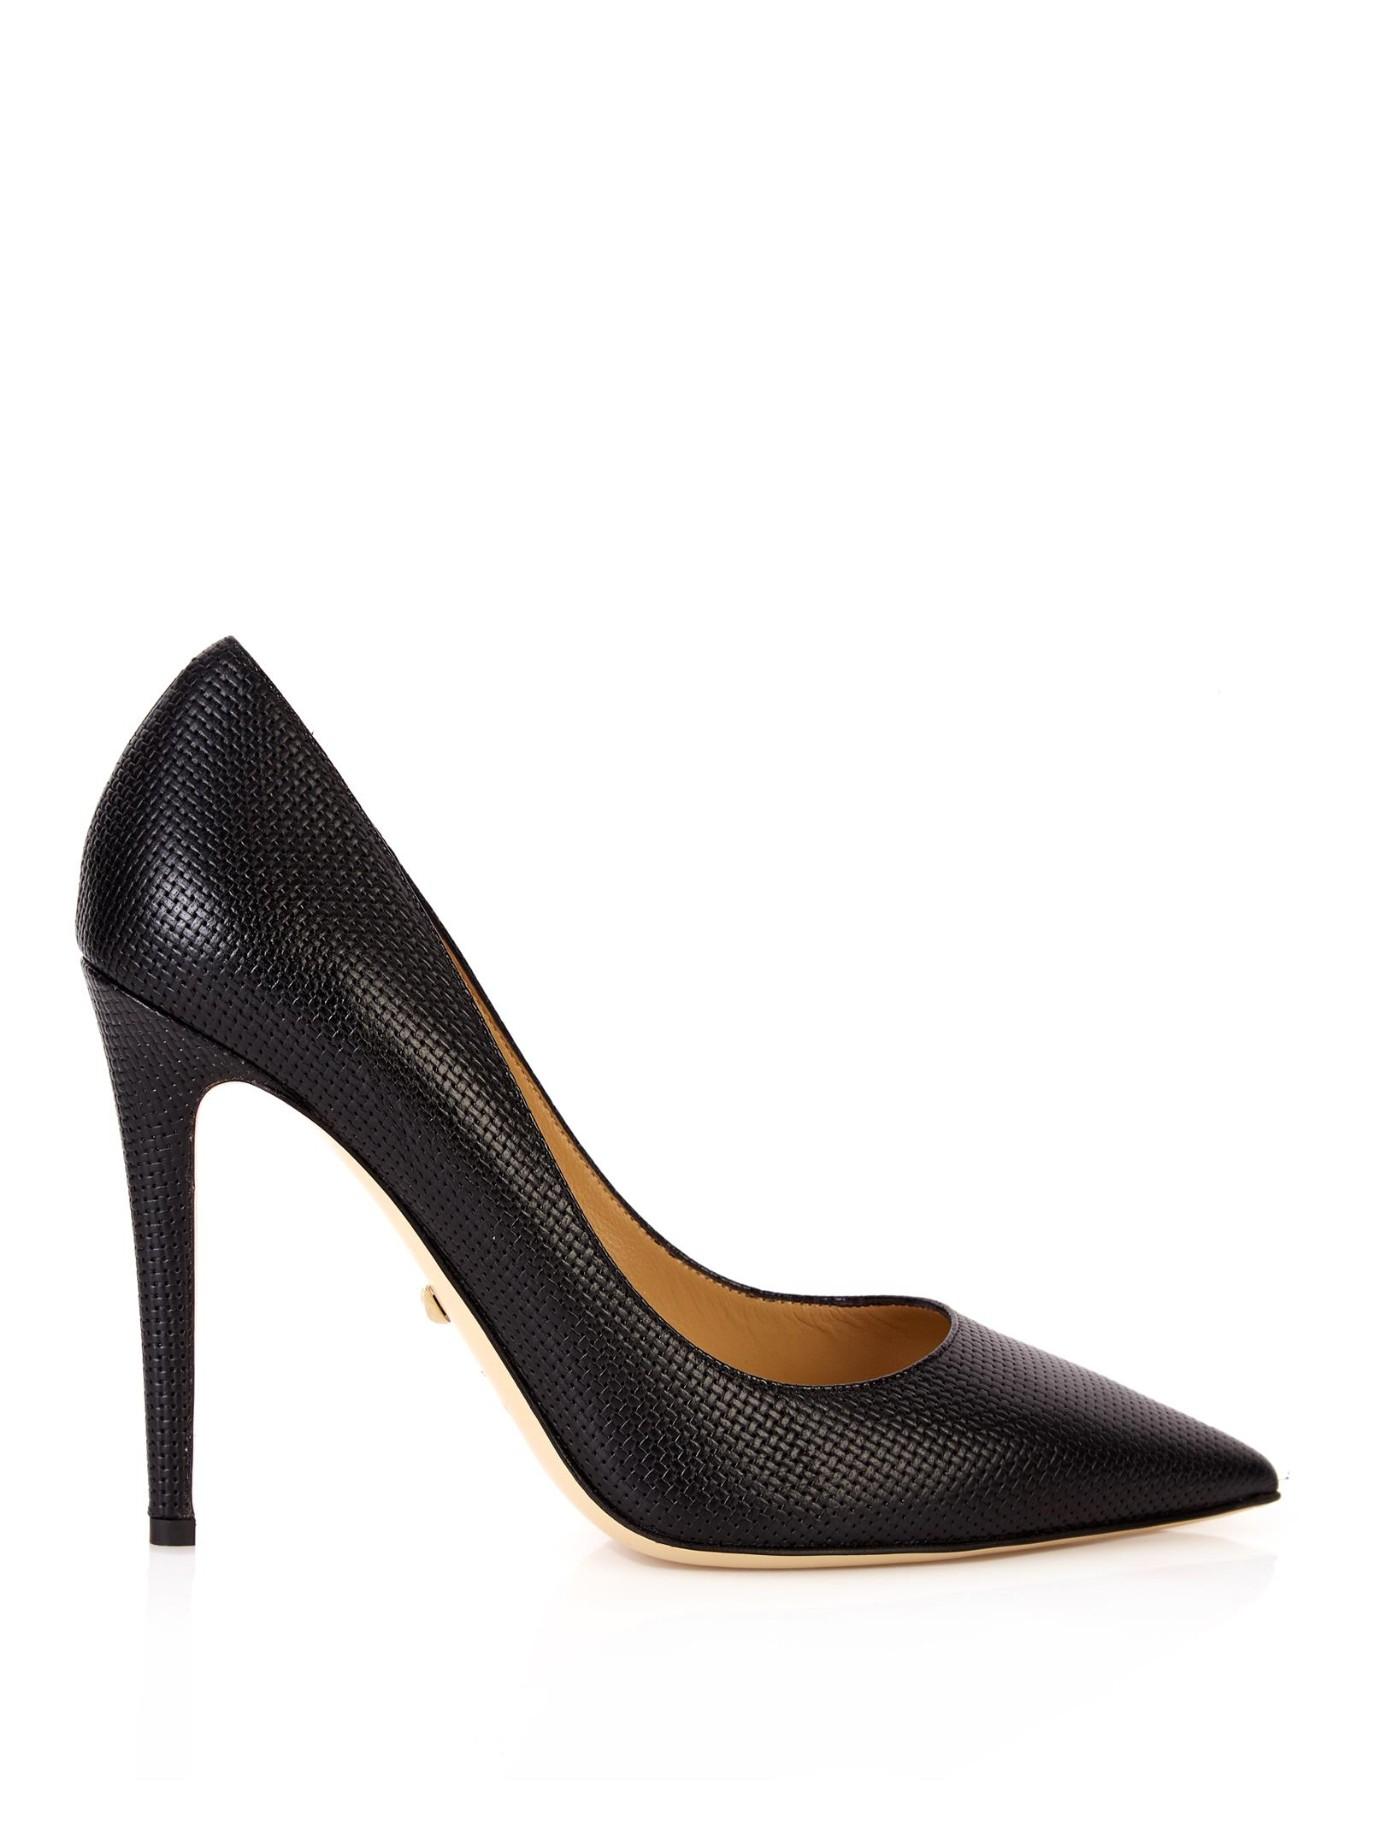 fast delivery online Diane von Furstenberg Metallic Patent Leather Pumps discount find great cheap recommend geniue stockist online 47UmGDOV8